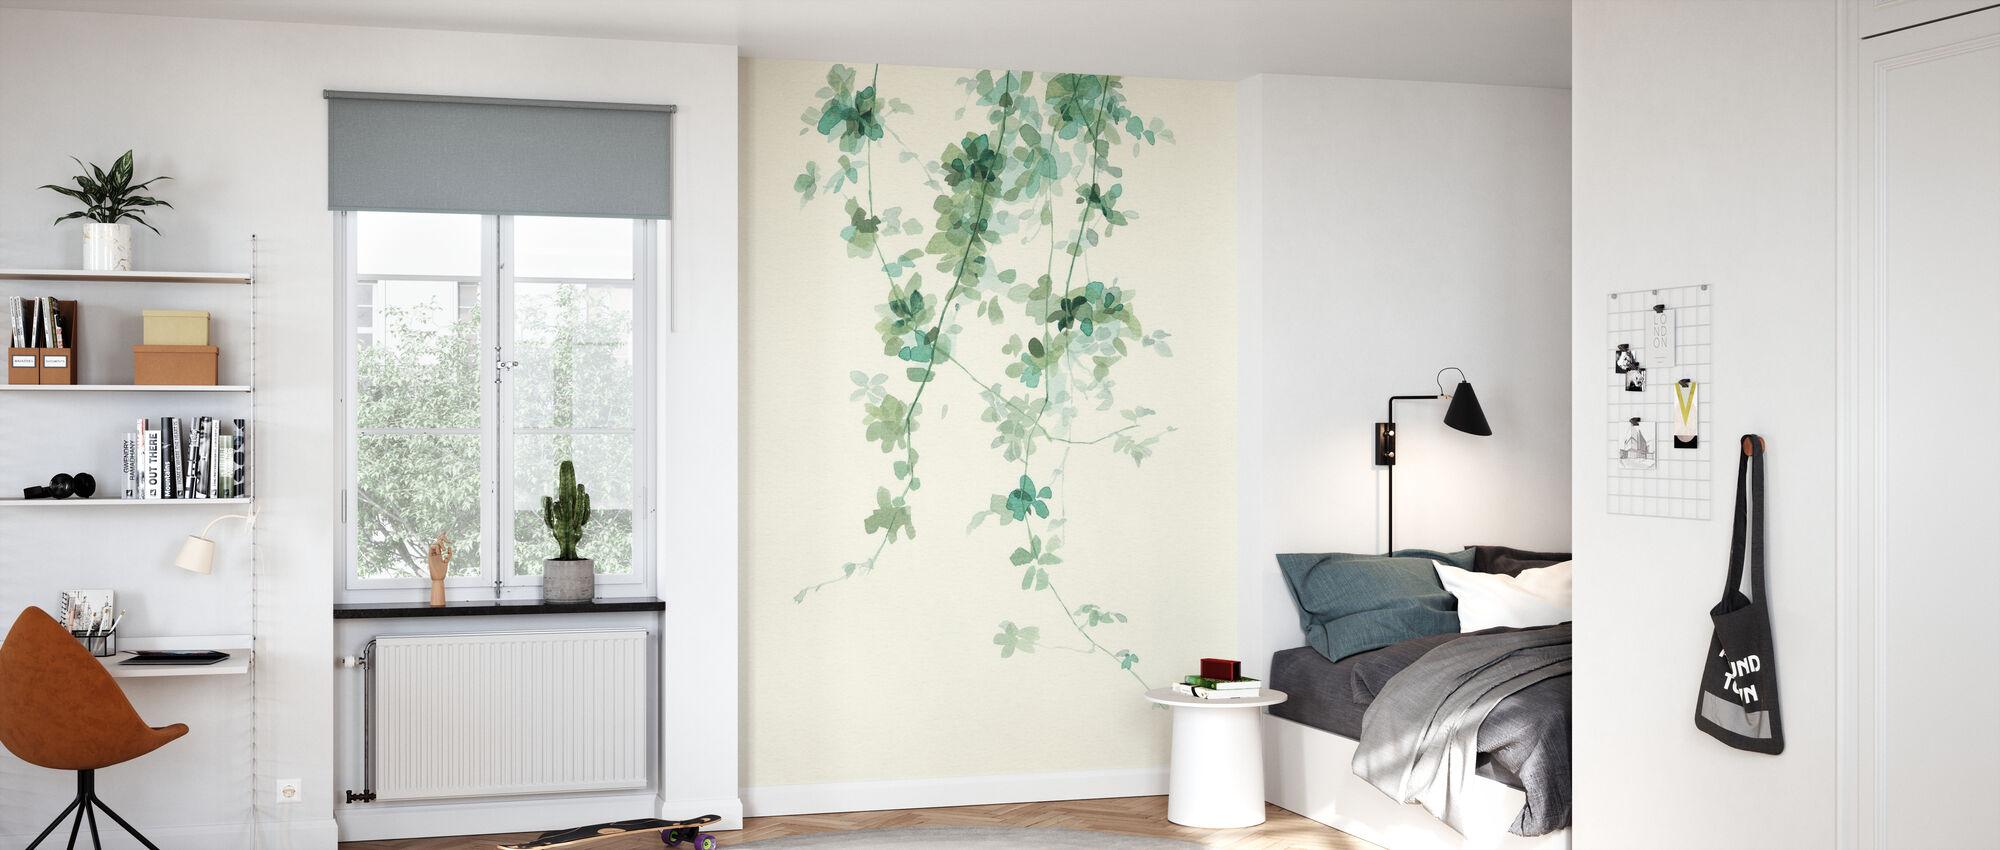 Trailing Vines II - Wallpaper - Kids Room